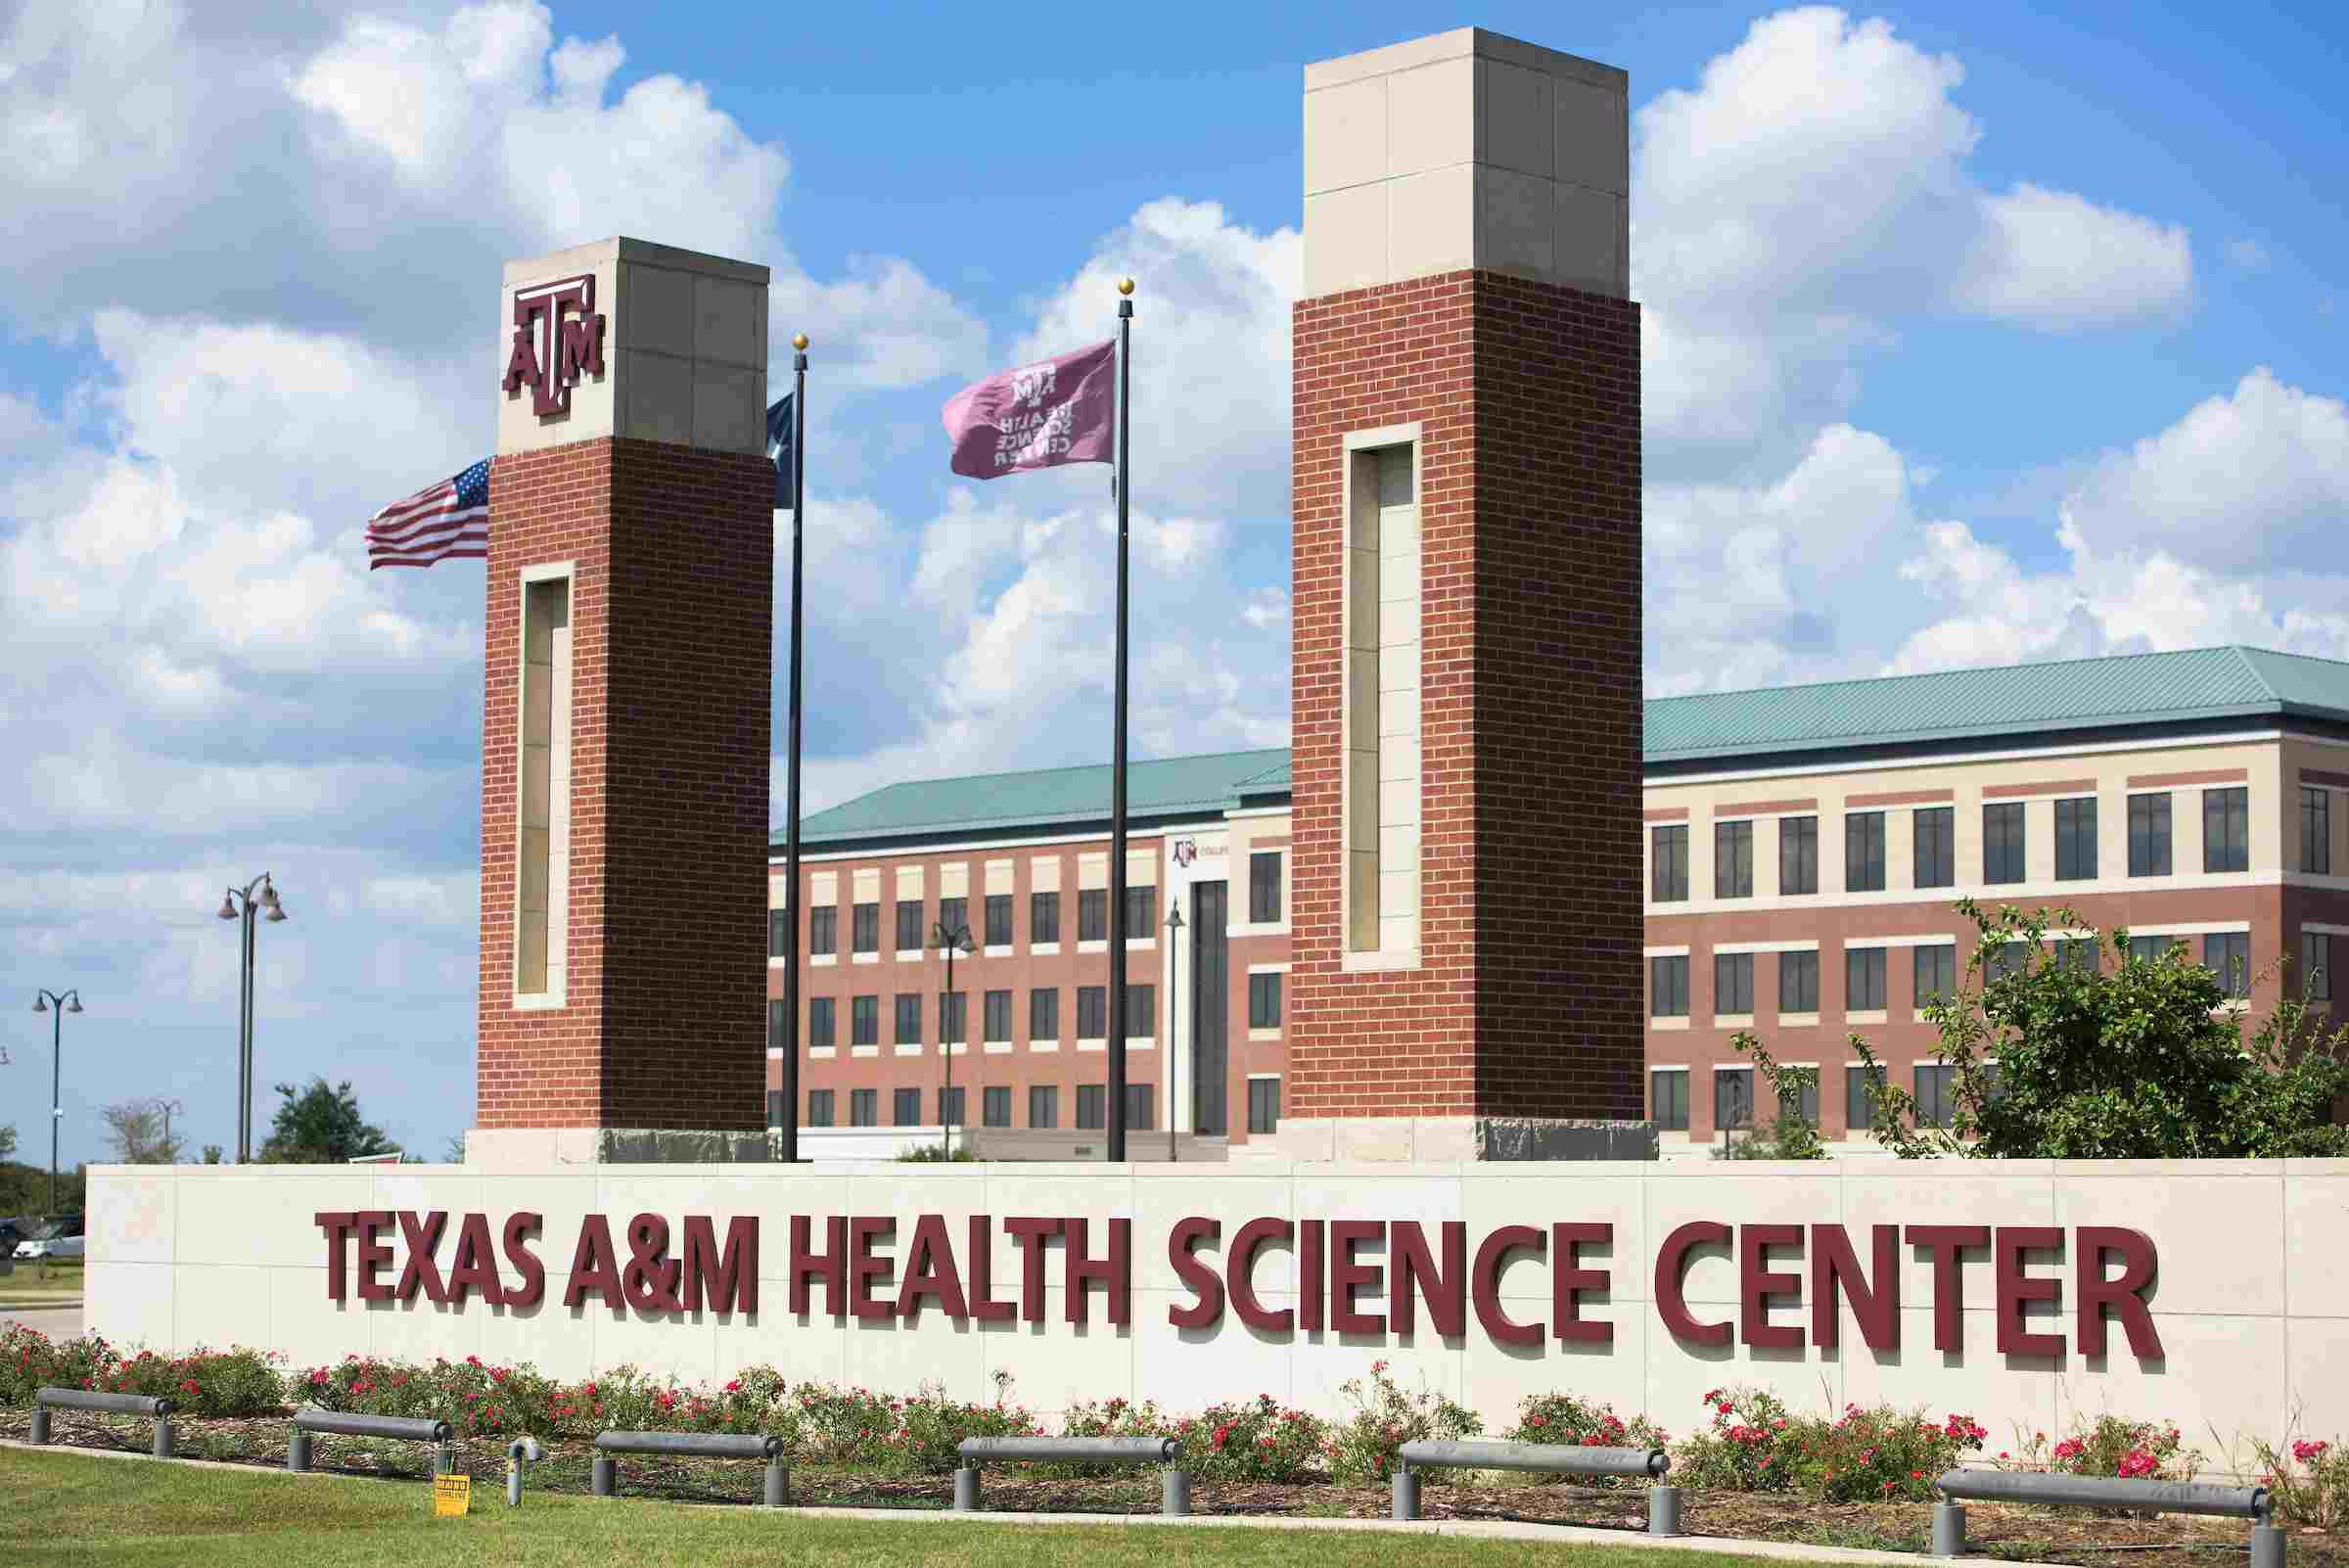 Texas A&M Health Science Center